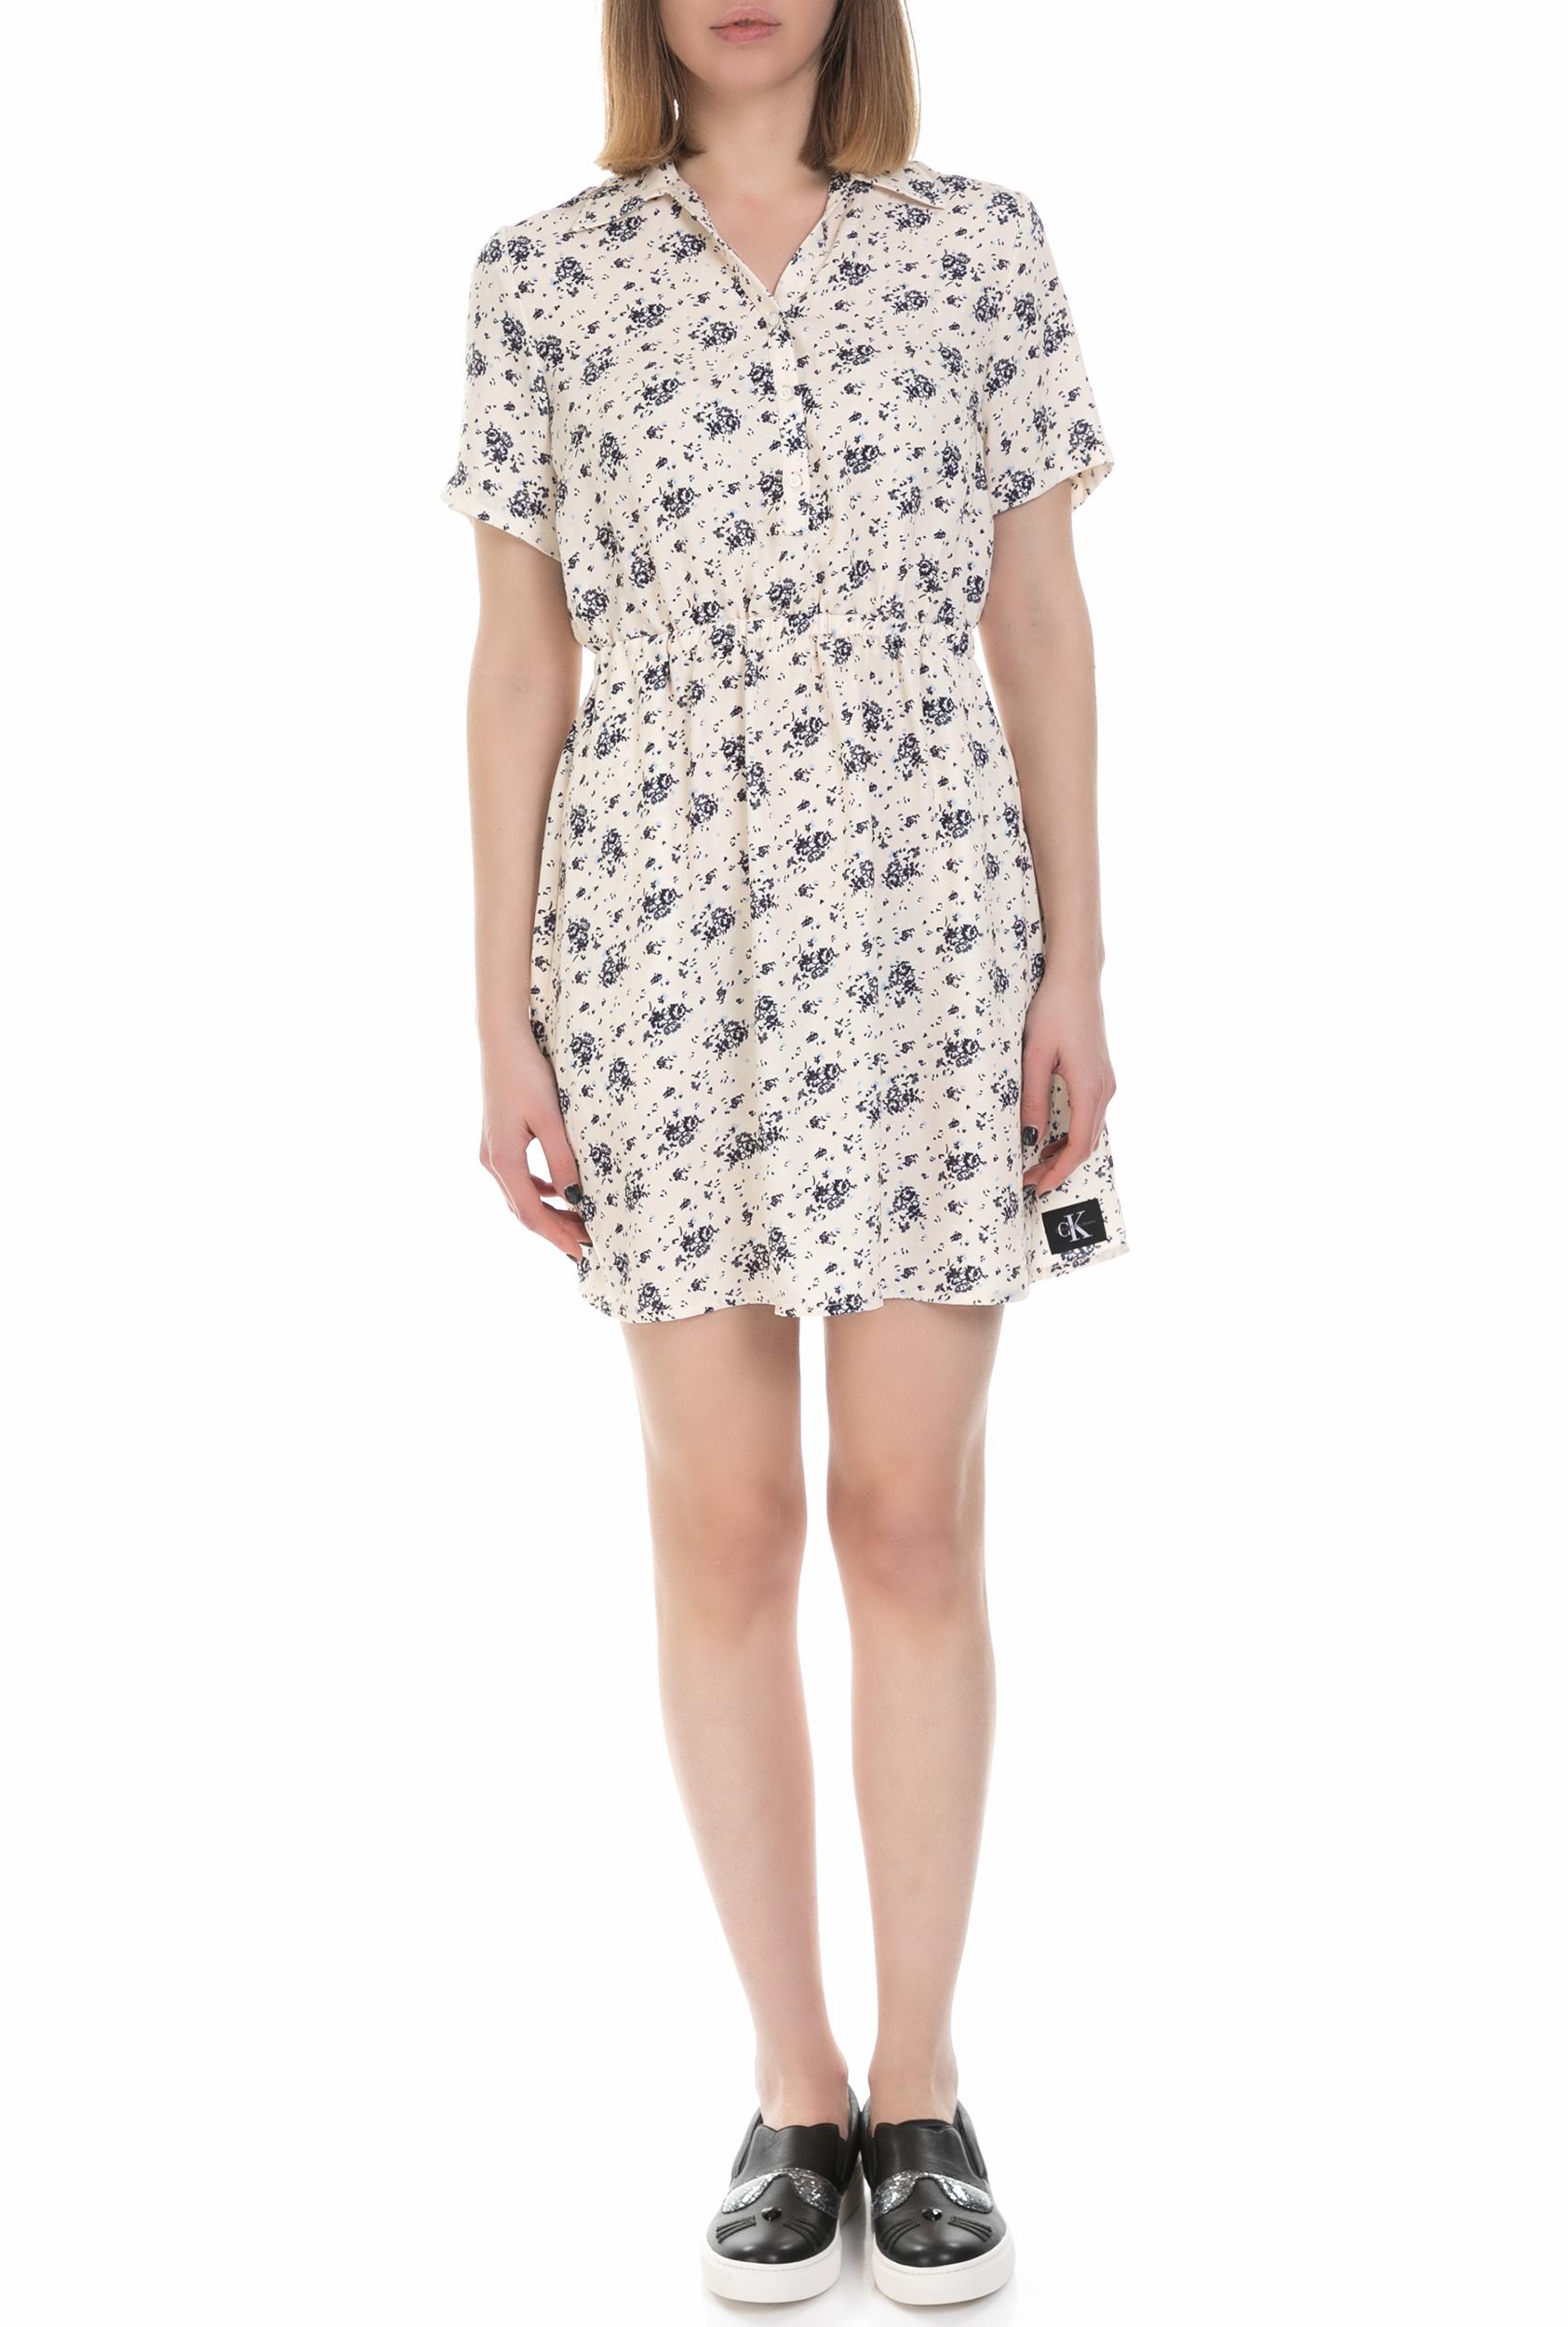 CALVIN KLEIN JEANS - Γυναικείο mini φόρεμα Calvin Klein Jeans ροζ